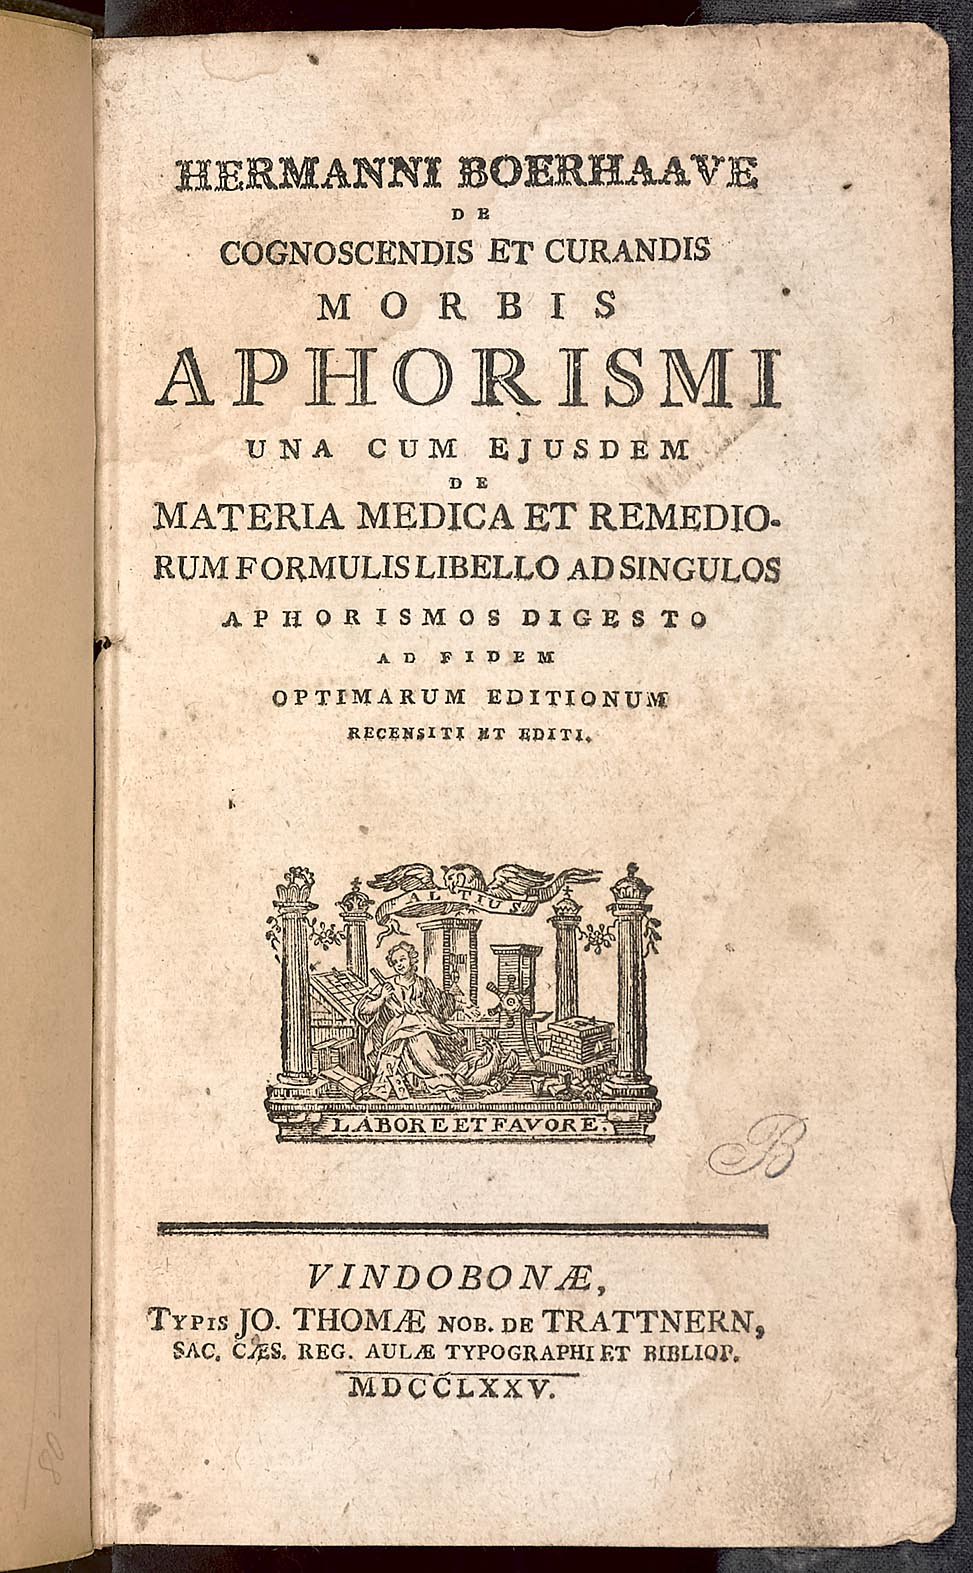 Hermann Boerhaave: De cognoscendis et curandis morbis aphorismi ...